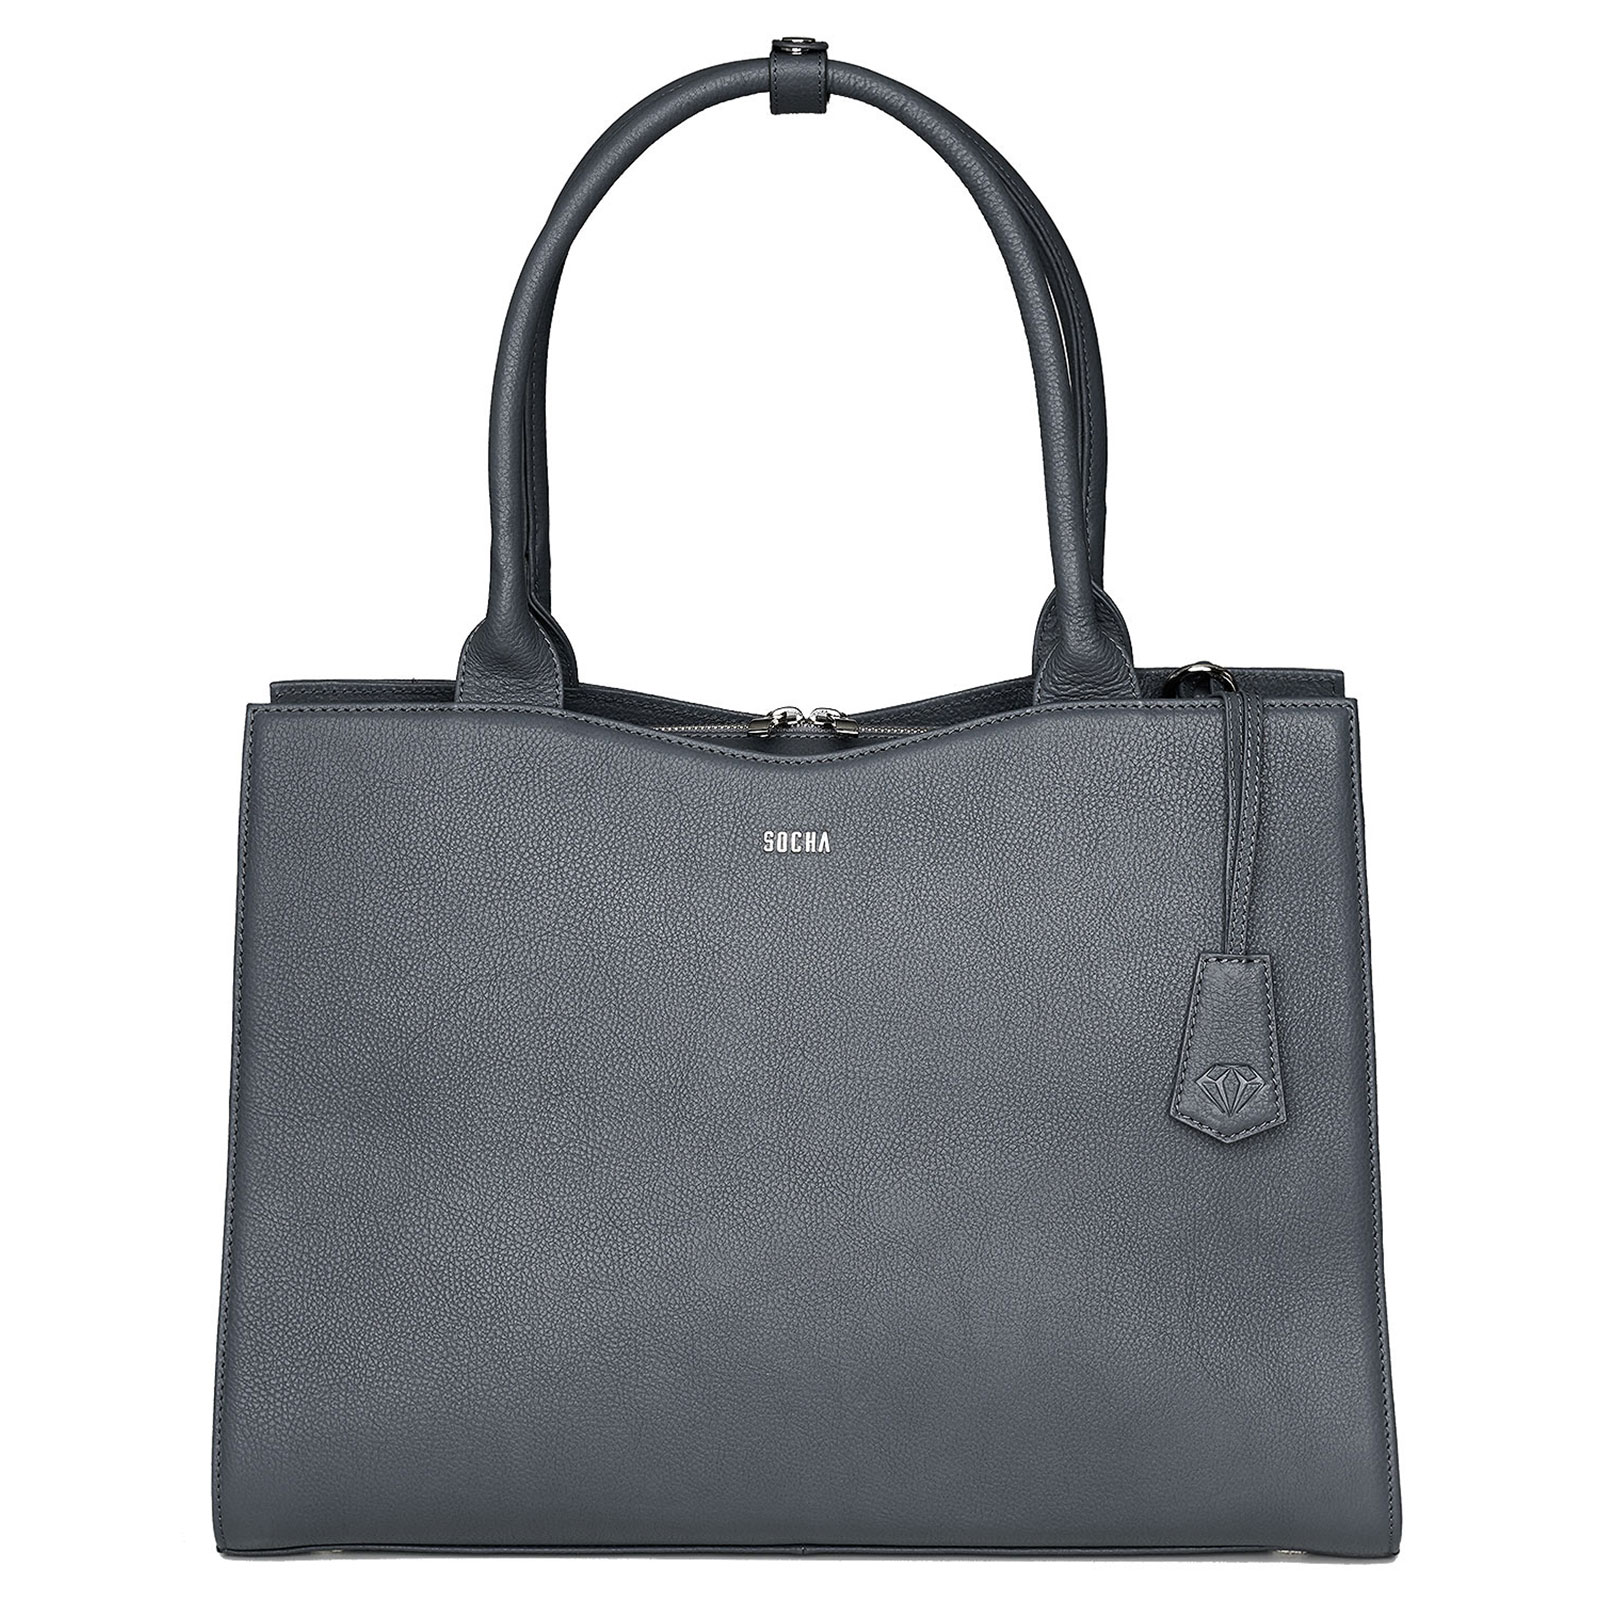 Aktentaschen SOCHA Diamond Bag Damen Handtasche 45 cm, Grau